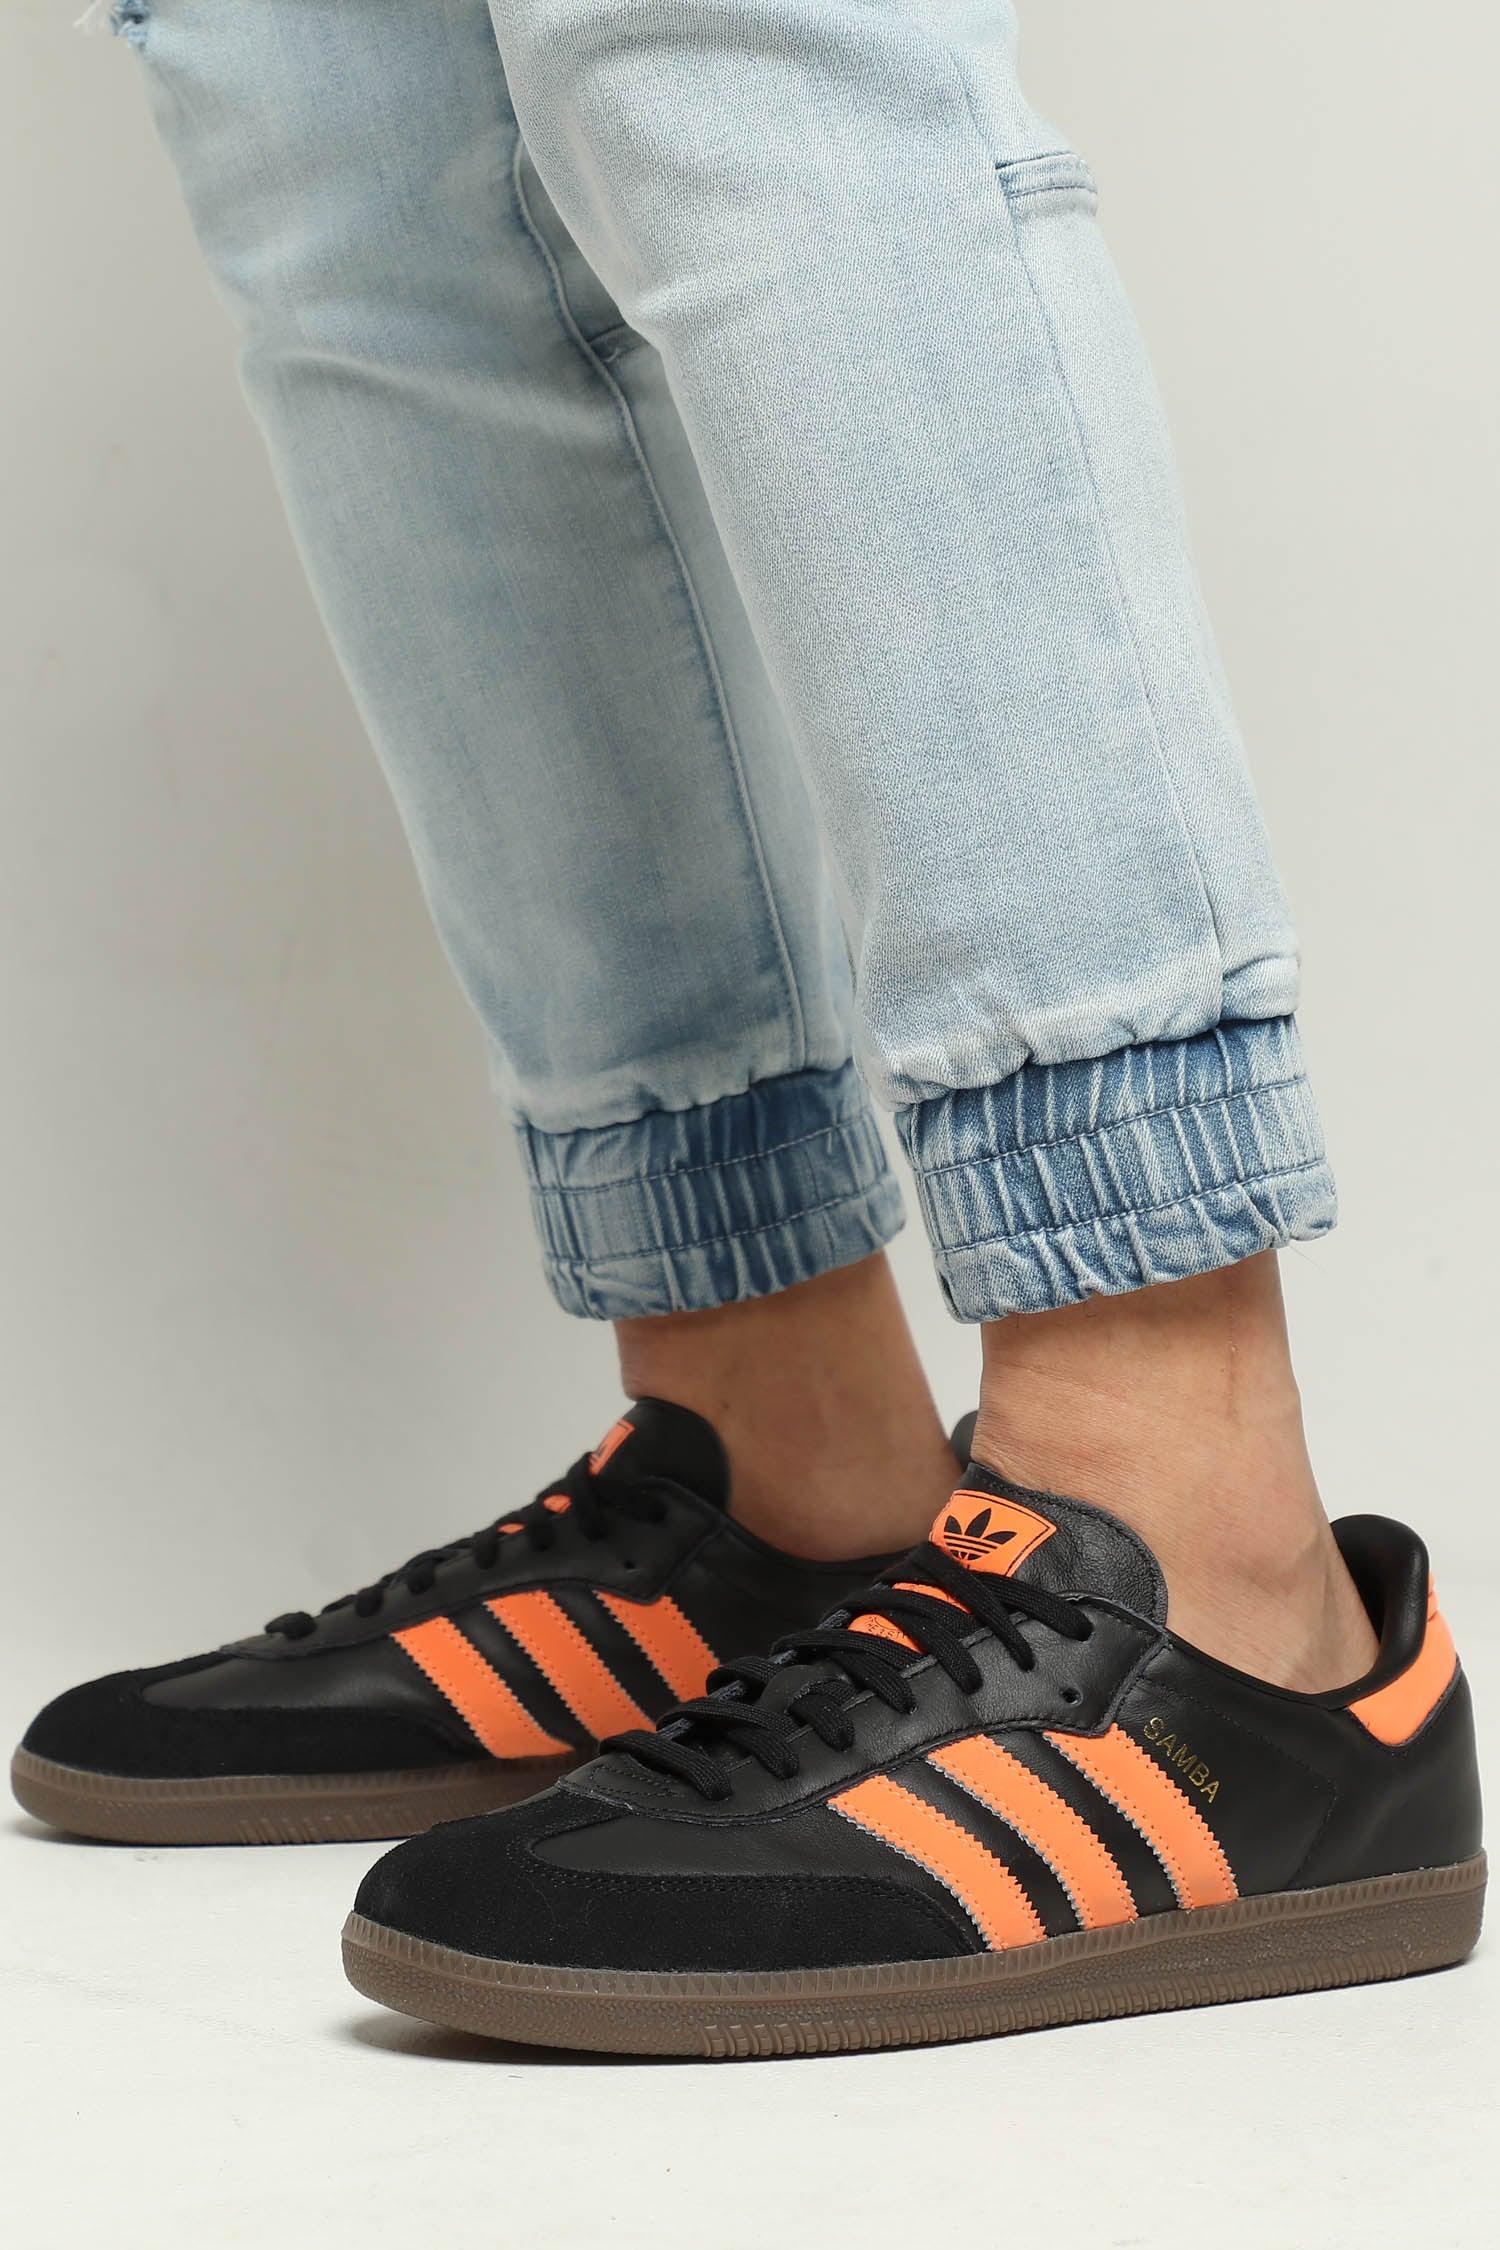 Adidas Samba OG Black/Orange | Culture